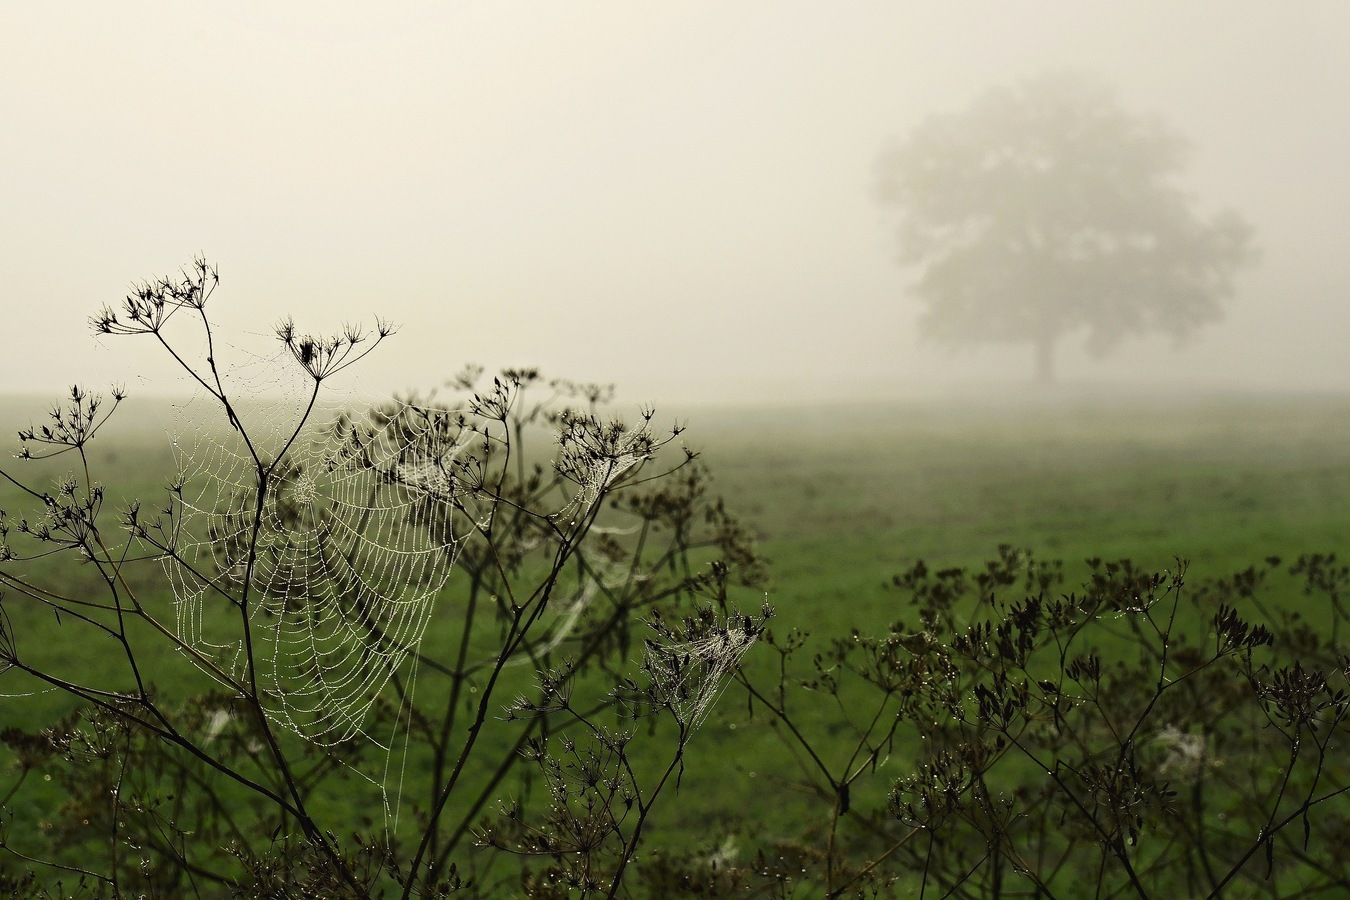 Podzimní mlha